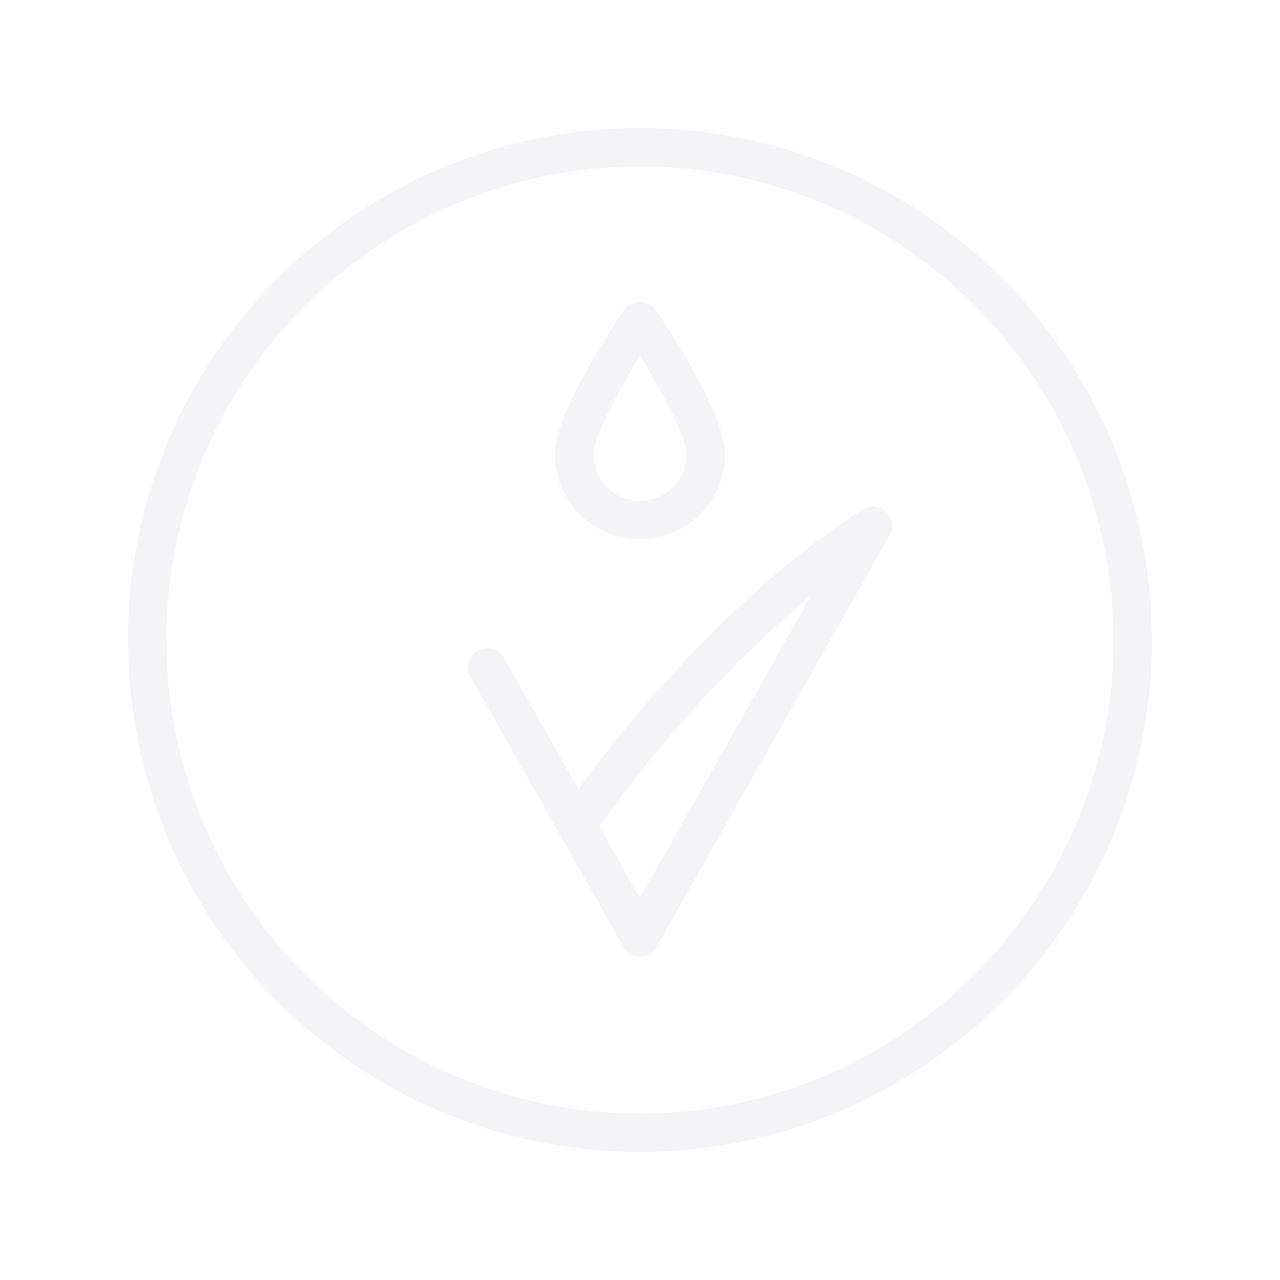 Collistar Body Multi-Active Deodorant 24 Hours Dry Spray 125ml